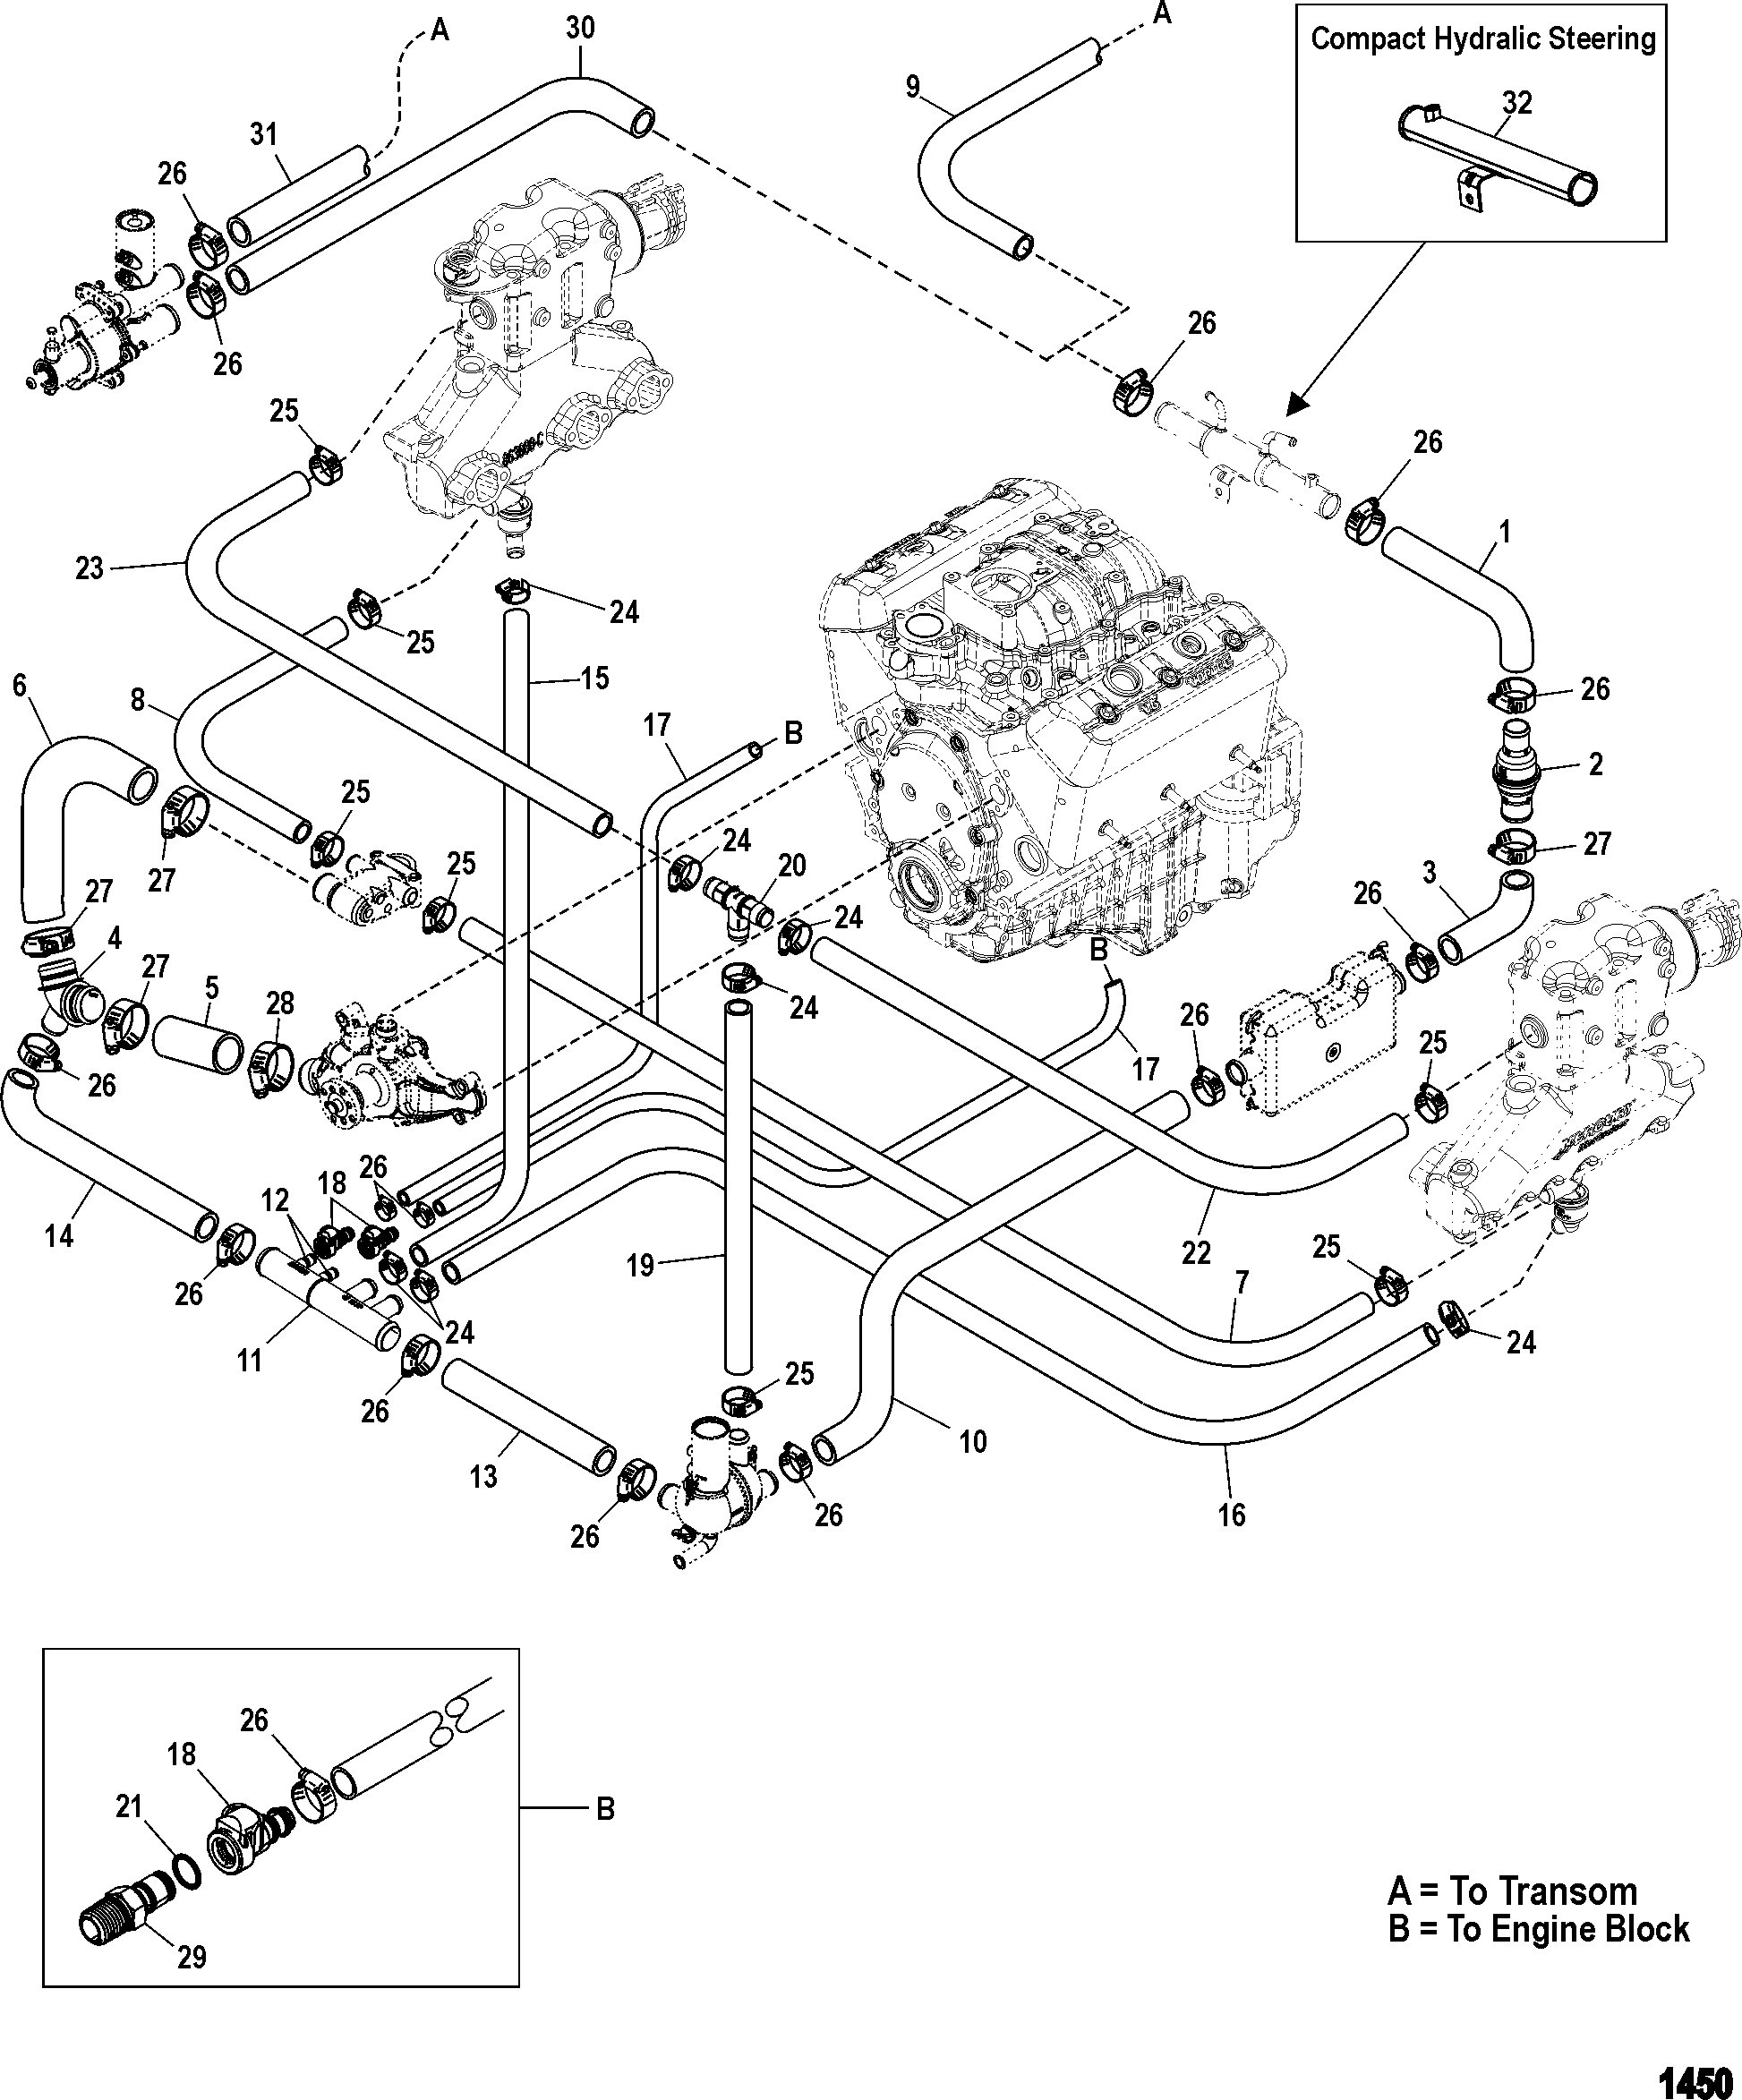 hight resolution of 4 3 vortec engine diagram elegant 4 3 vortec wiring diagram diagram of 4 3 vortec